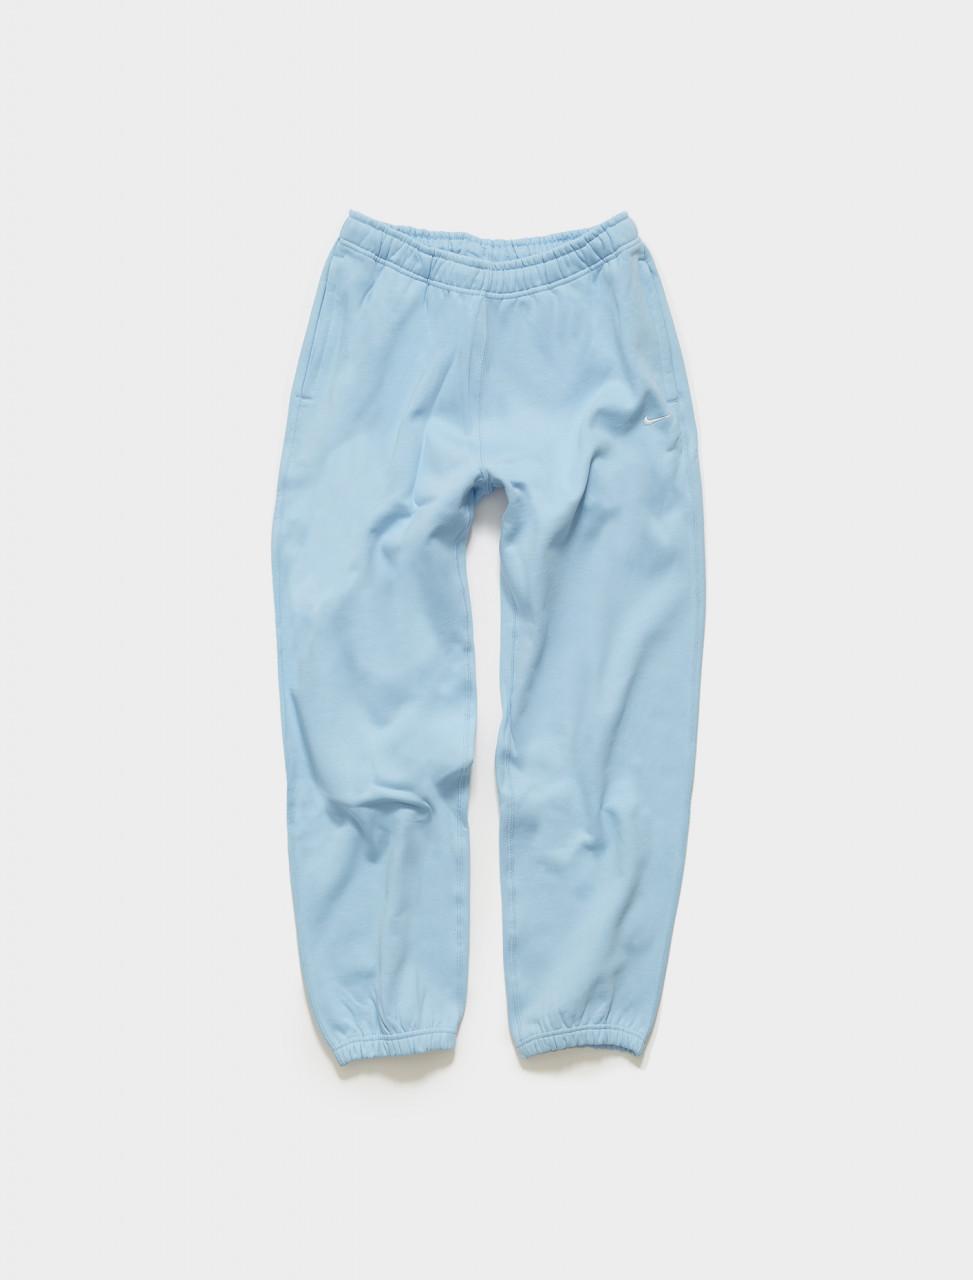 CW5565-436 NIKE WMNS NRG SOLO SWOOSH FLEECE PANTS IN PSYCHIC BLUE